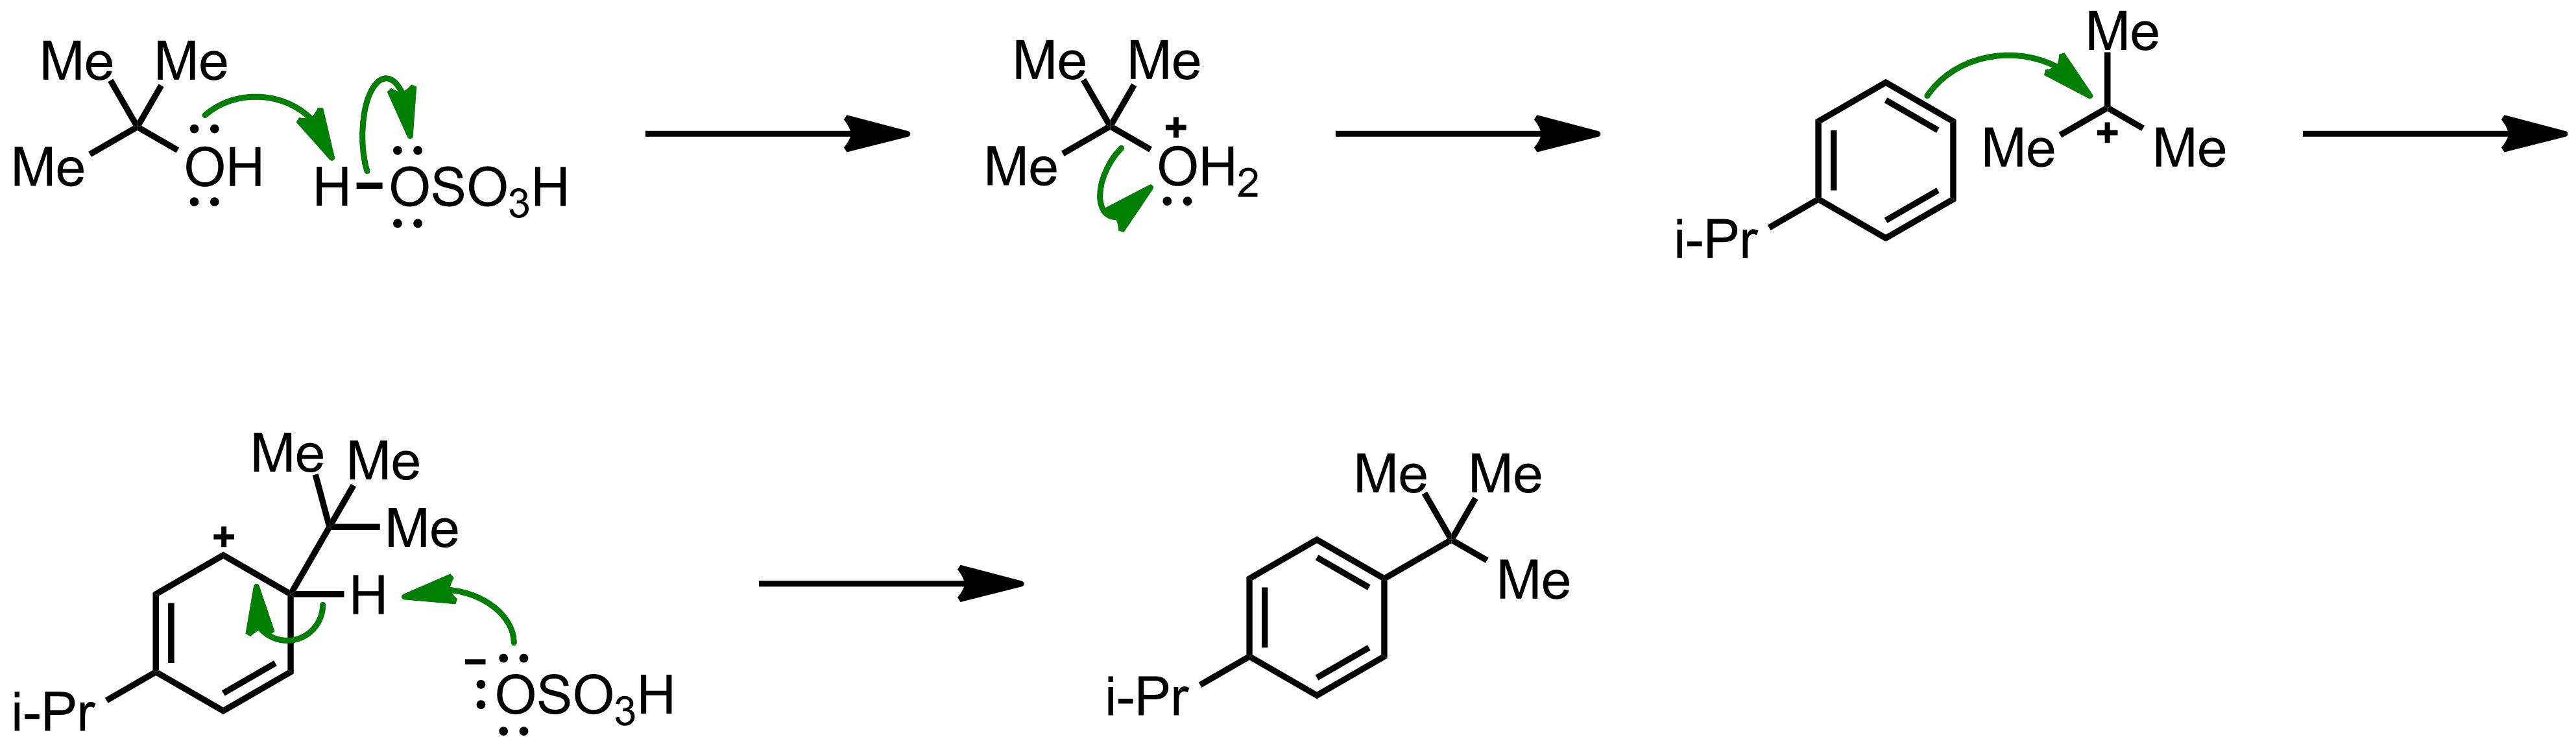 Mechanism of the Friedel-Crafts Alkylation